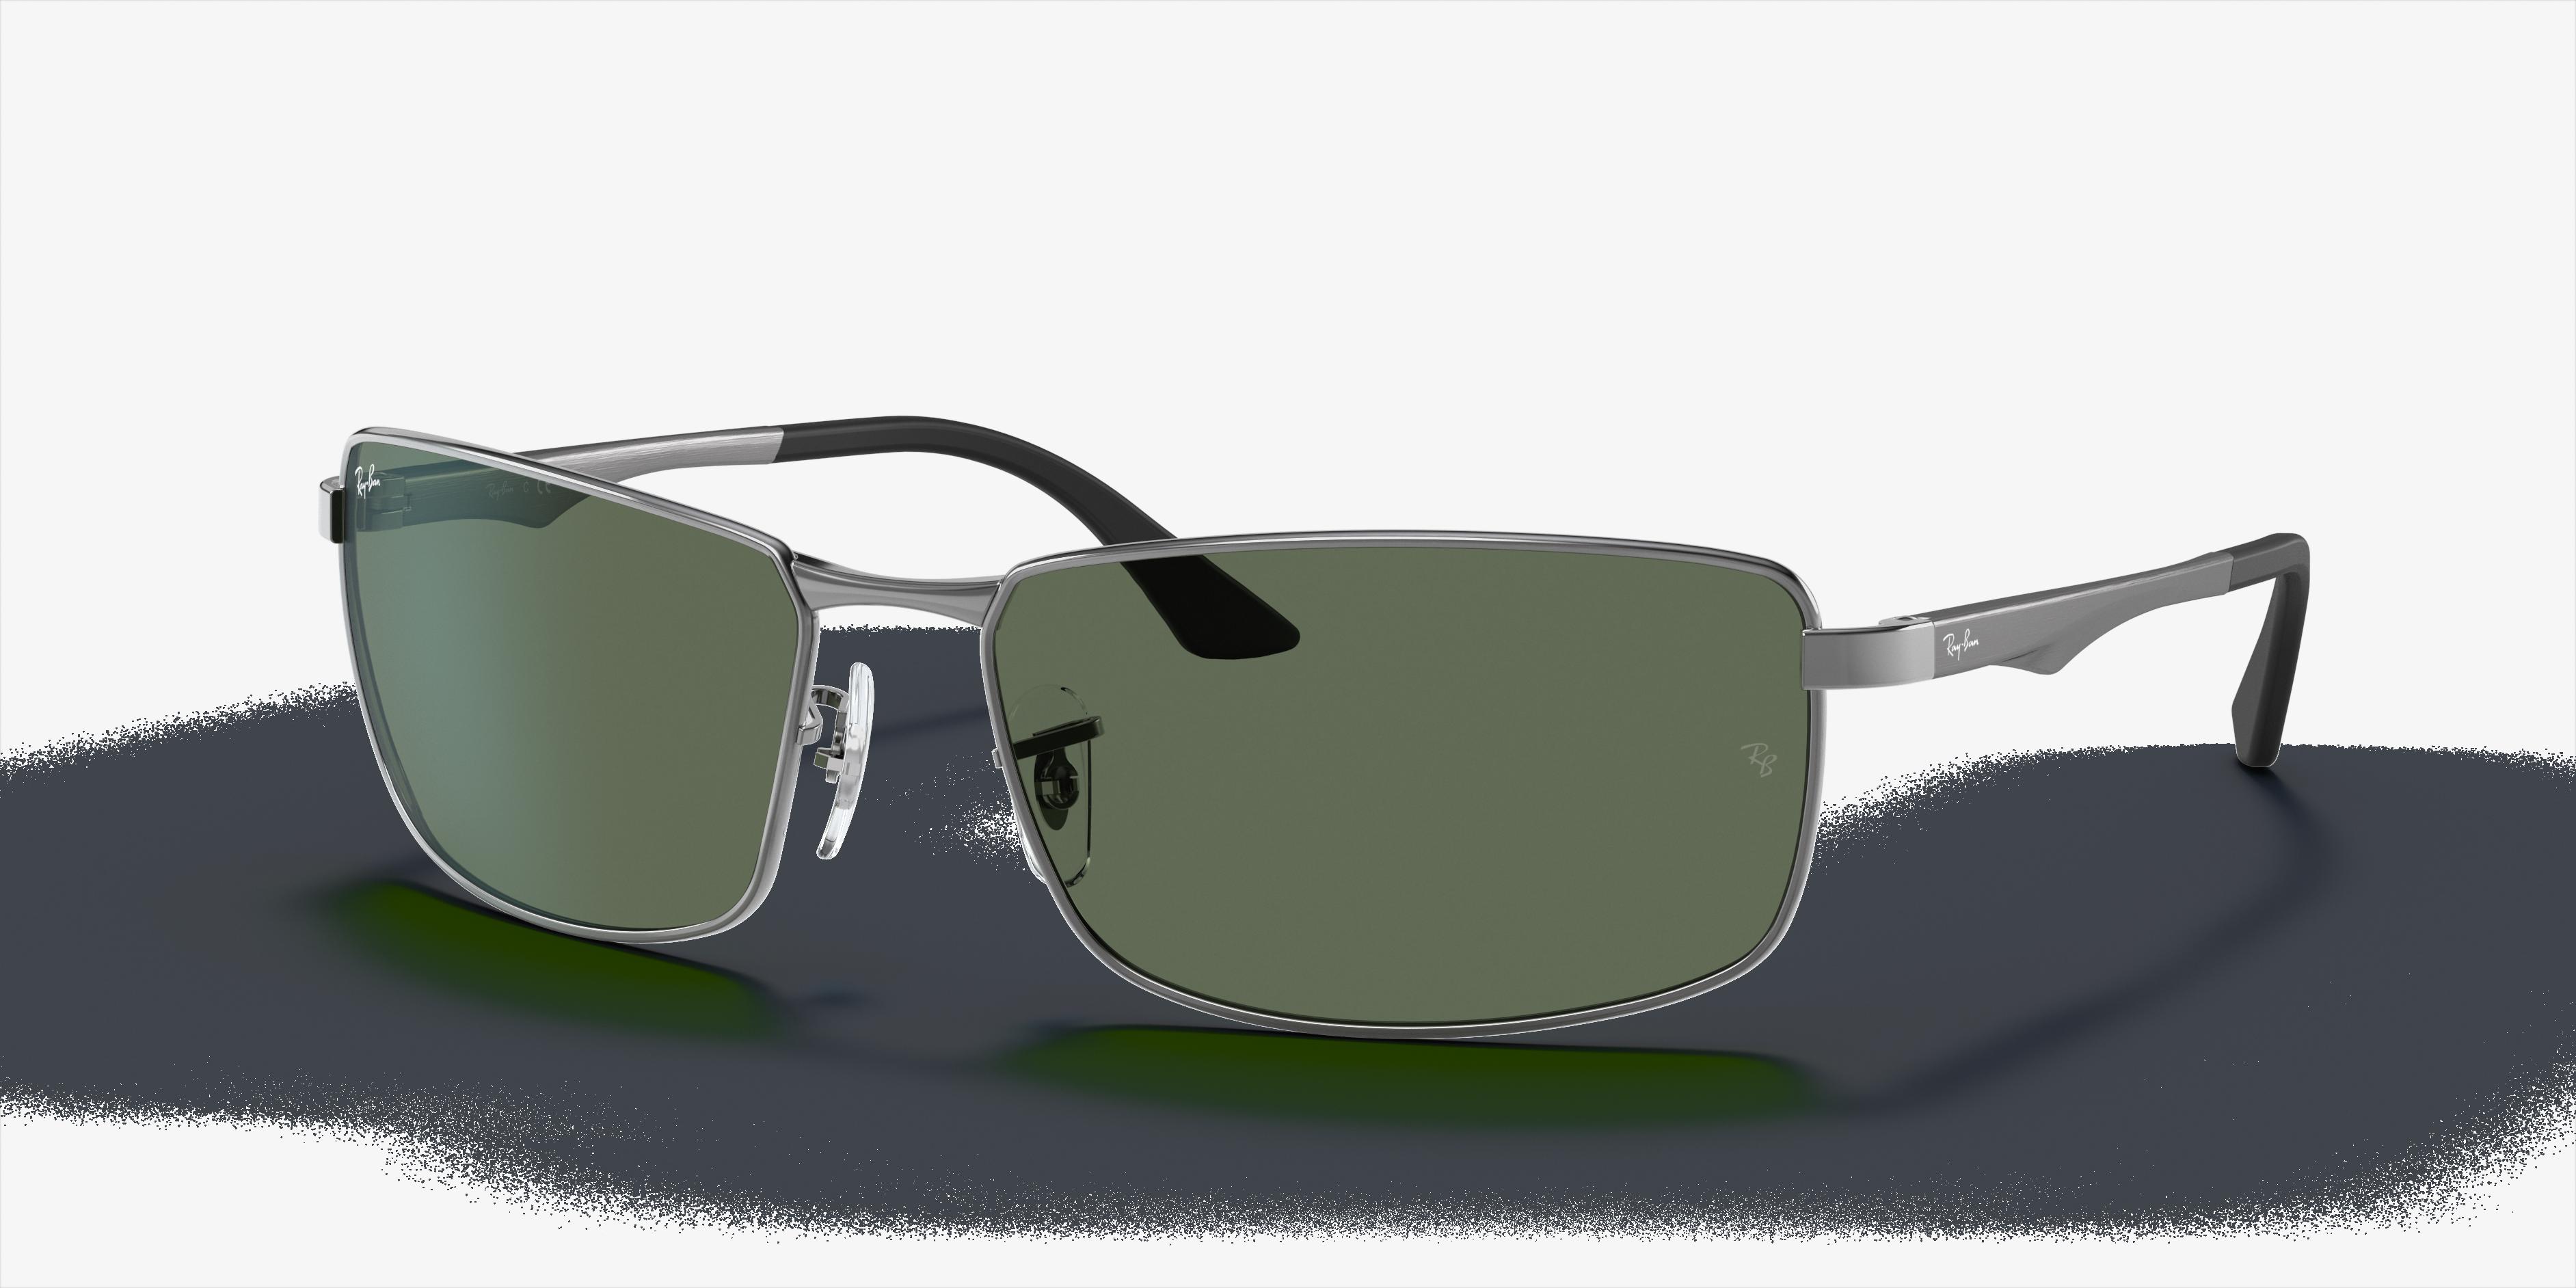 Ray-Ban Rb3498 Gunmetal, Green Lenses - RB3498